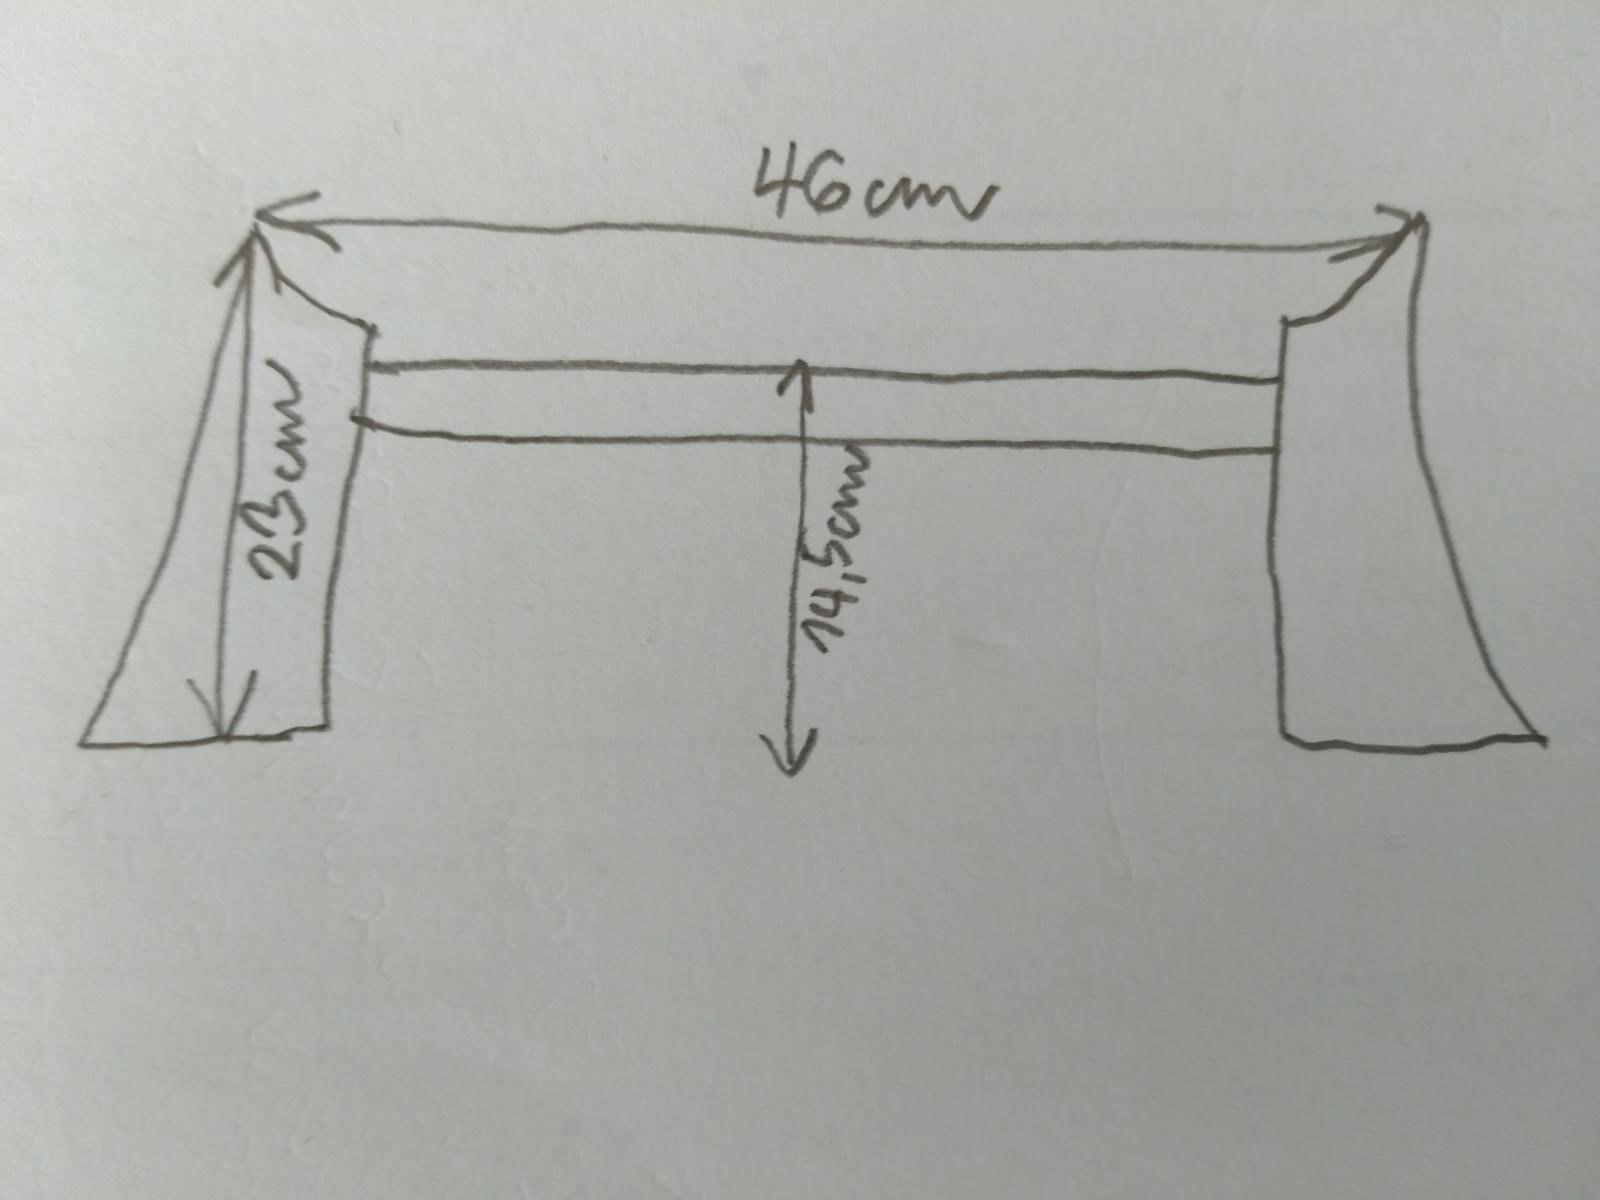 Plechové nohy na klasickú vaňu - Obrázok č. 3